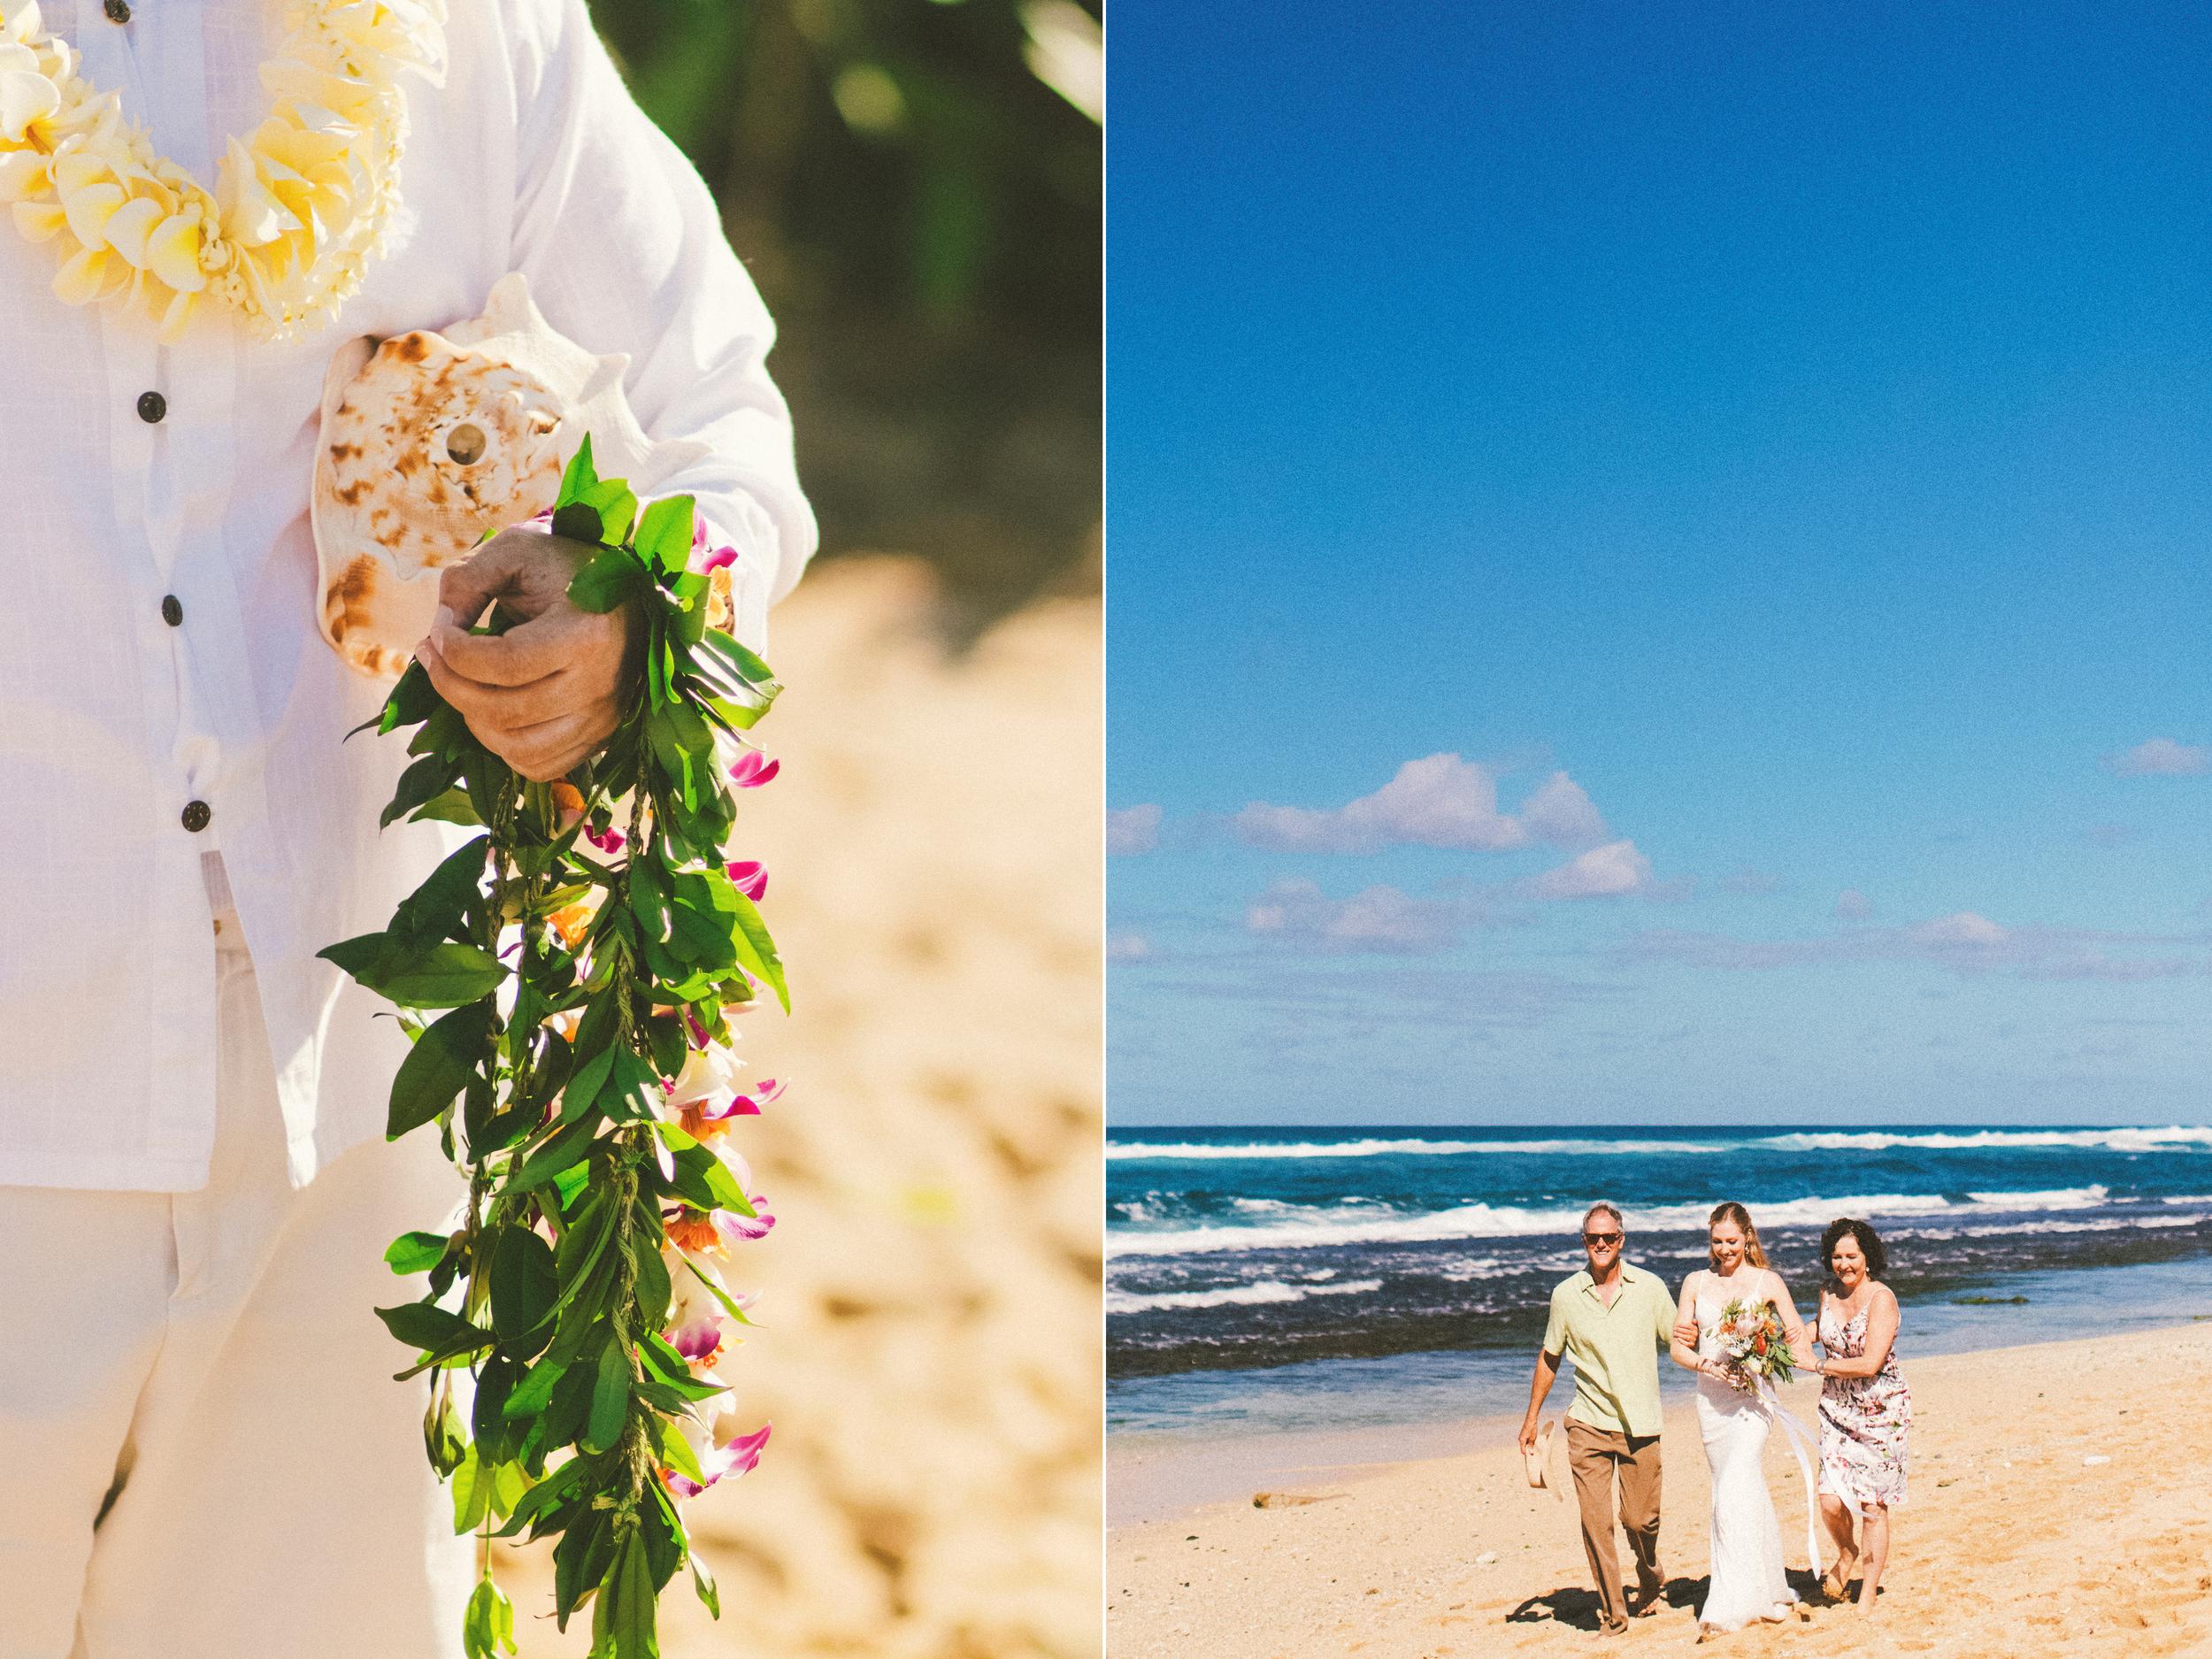 angie-diaz-photography-maui-wedding-48.jpg